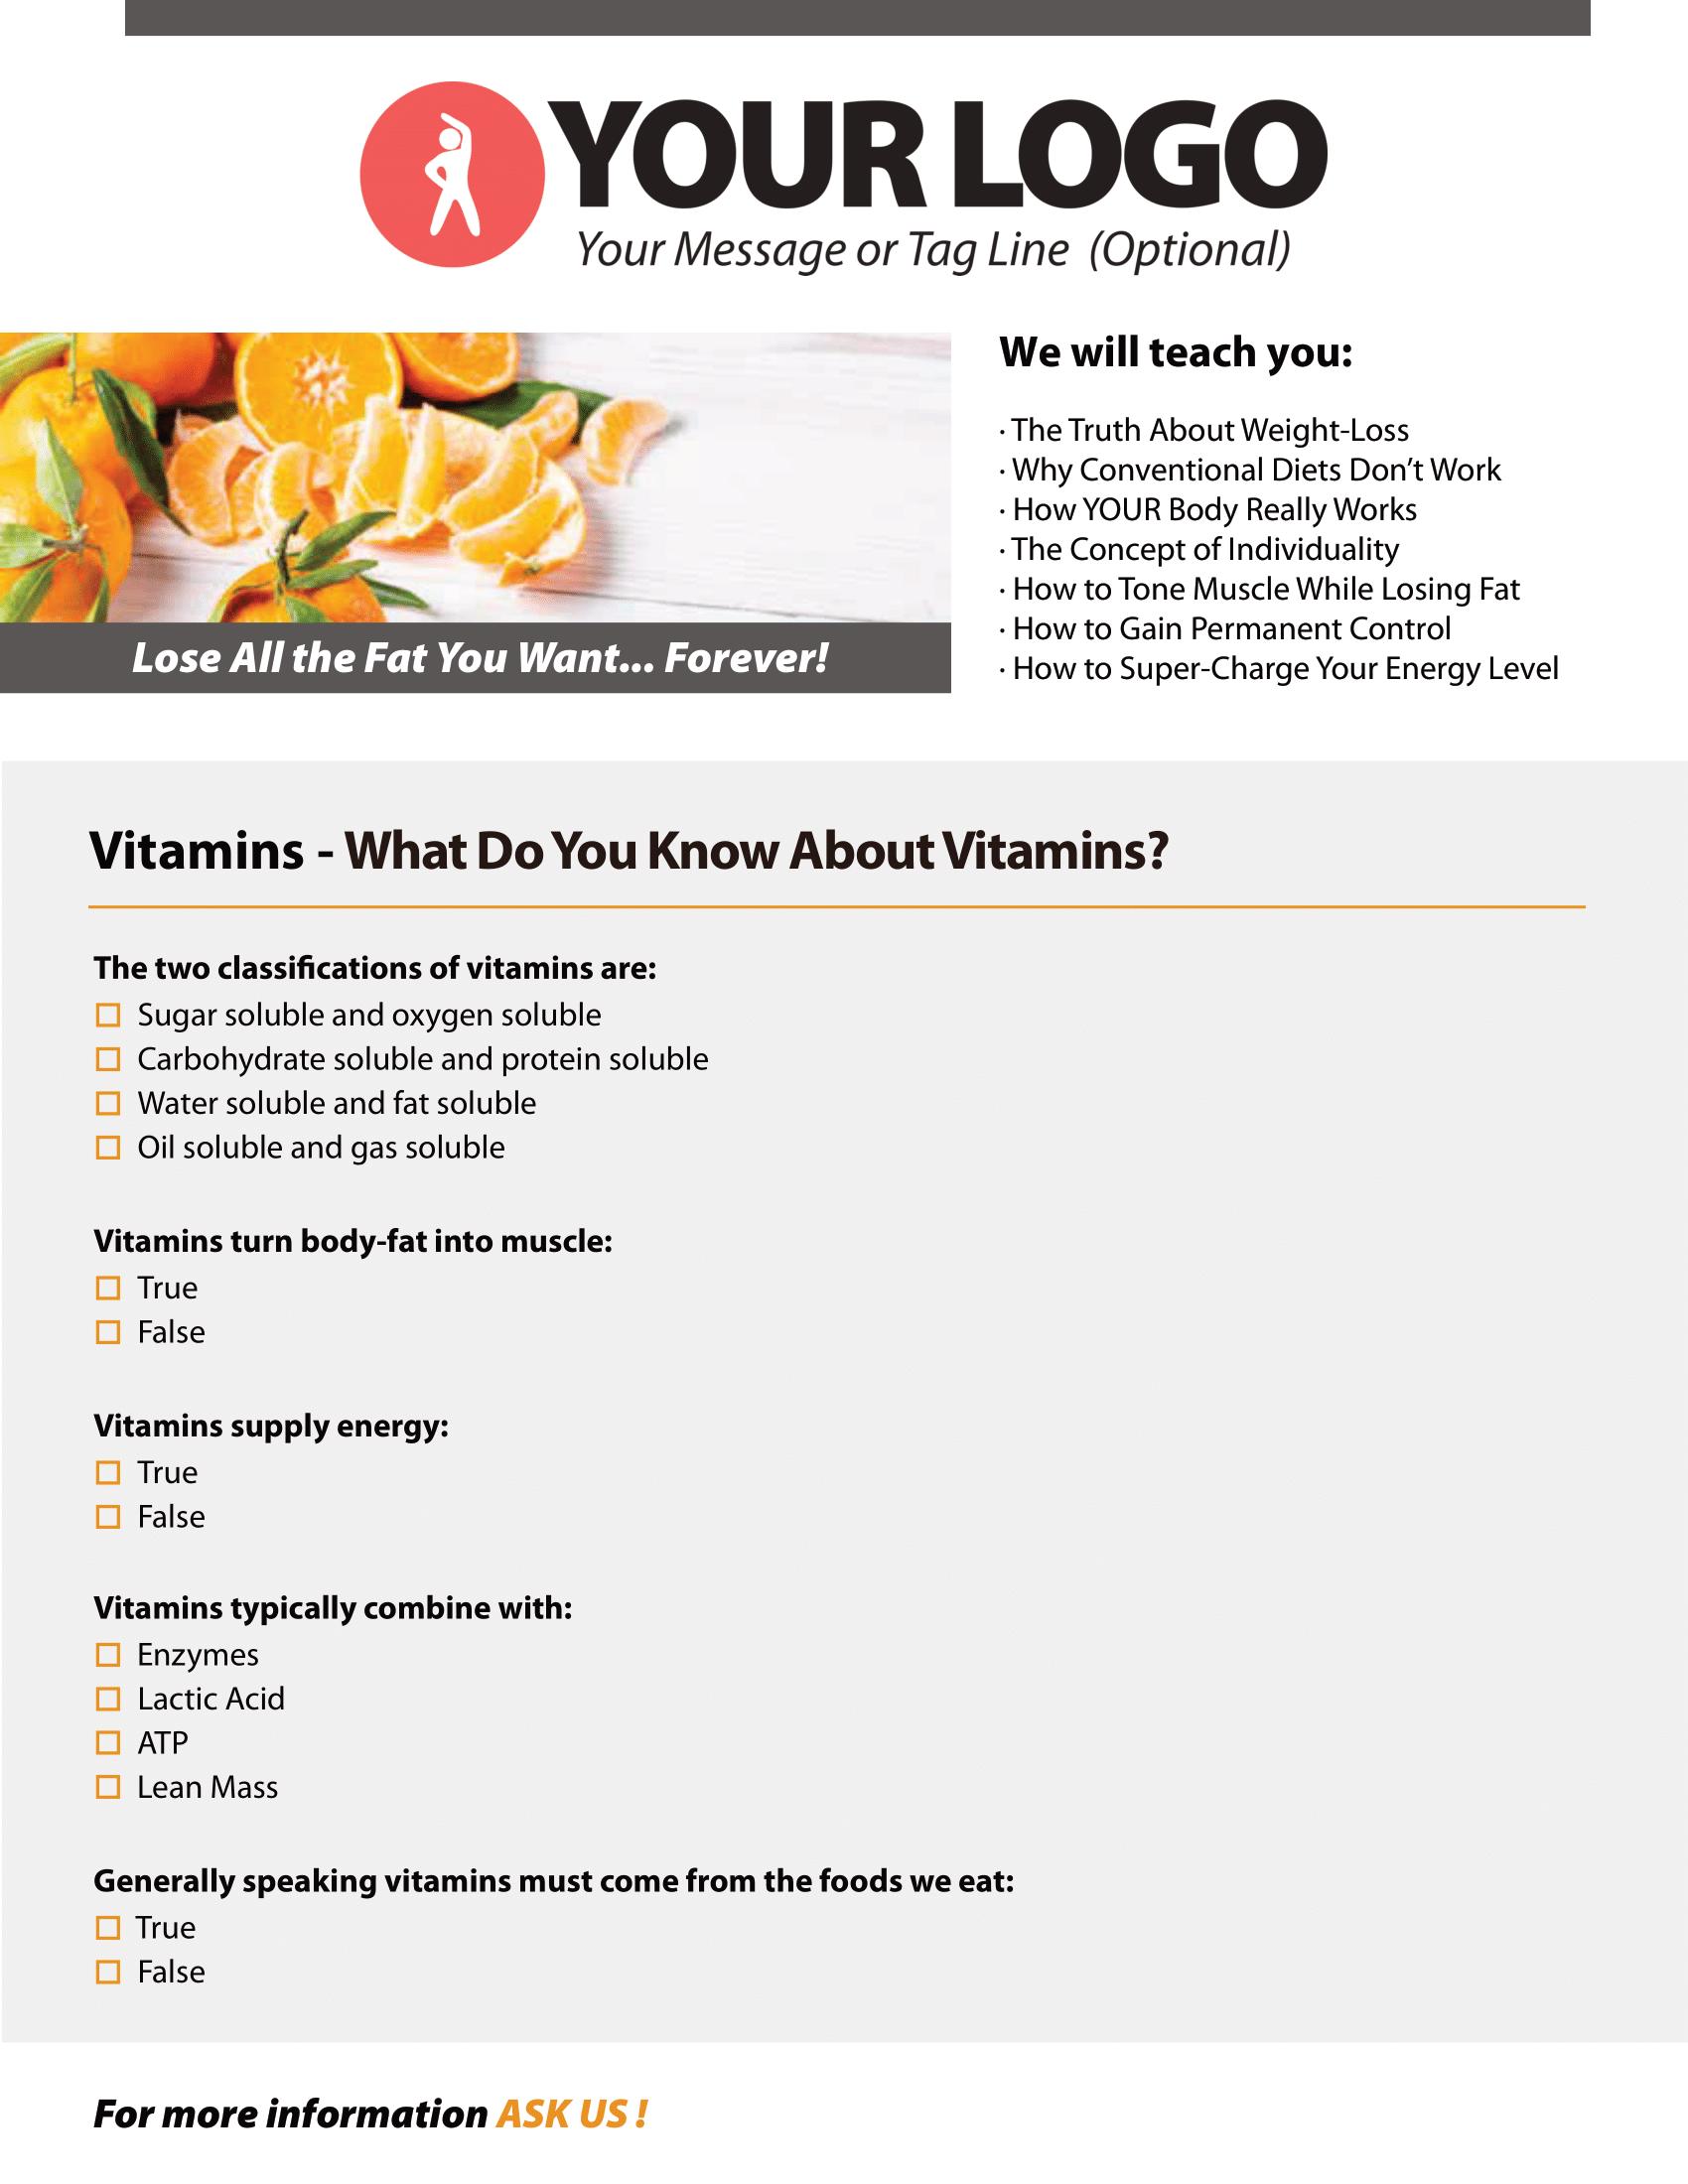 YOUR_LOGO_Quiz08_WE-1